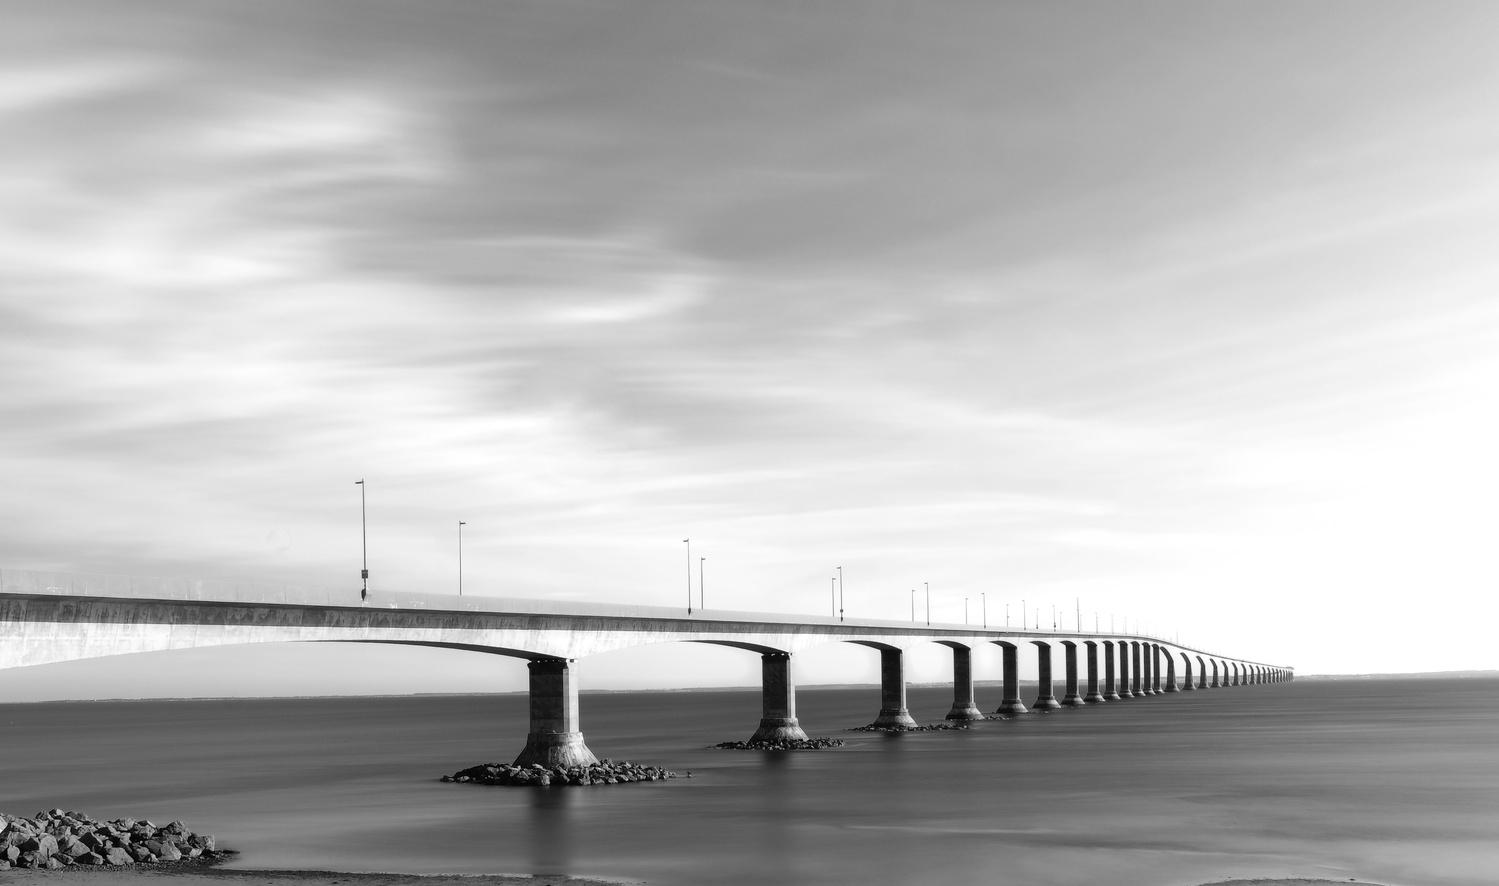 The Bridge by John Pettigrew